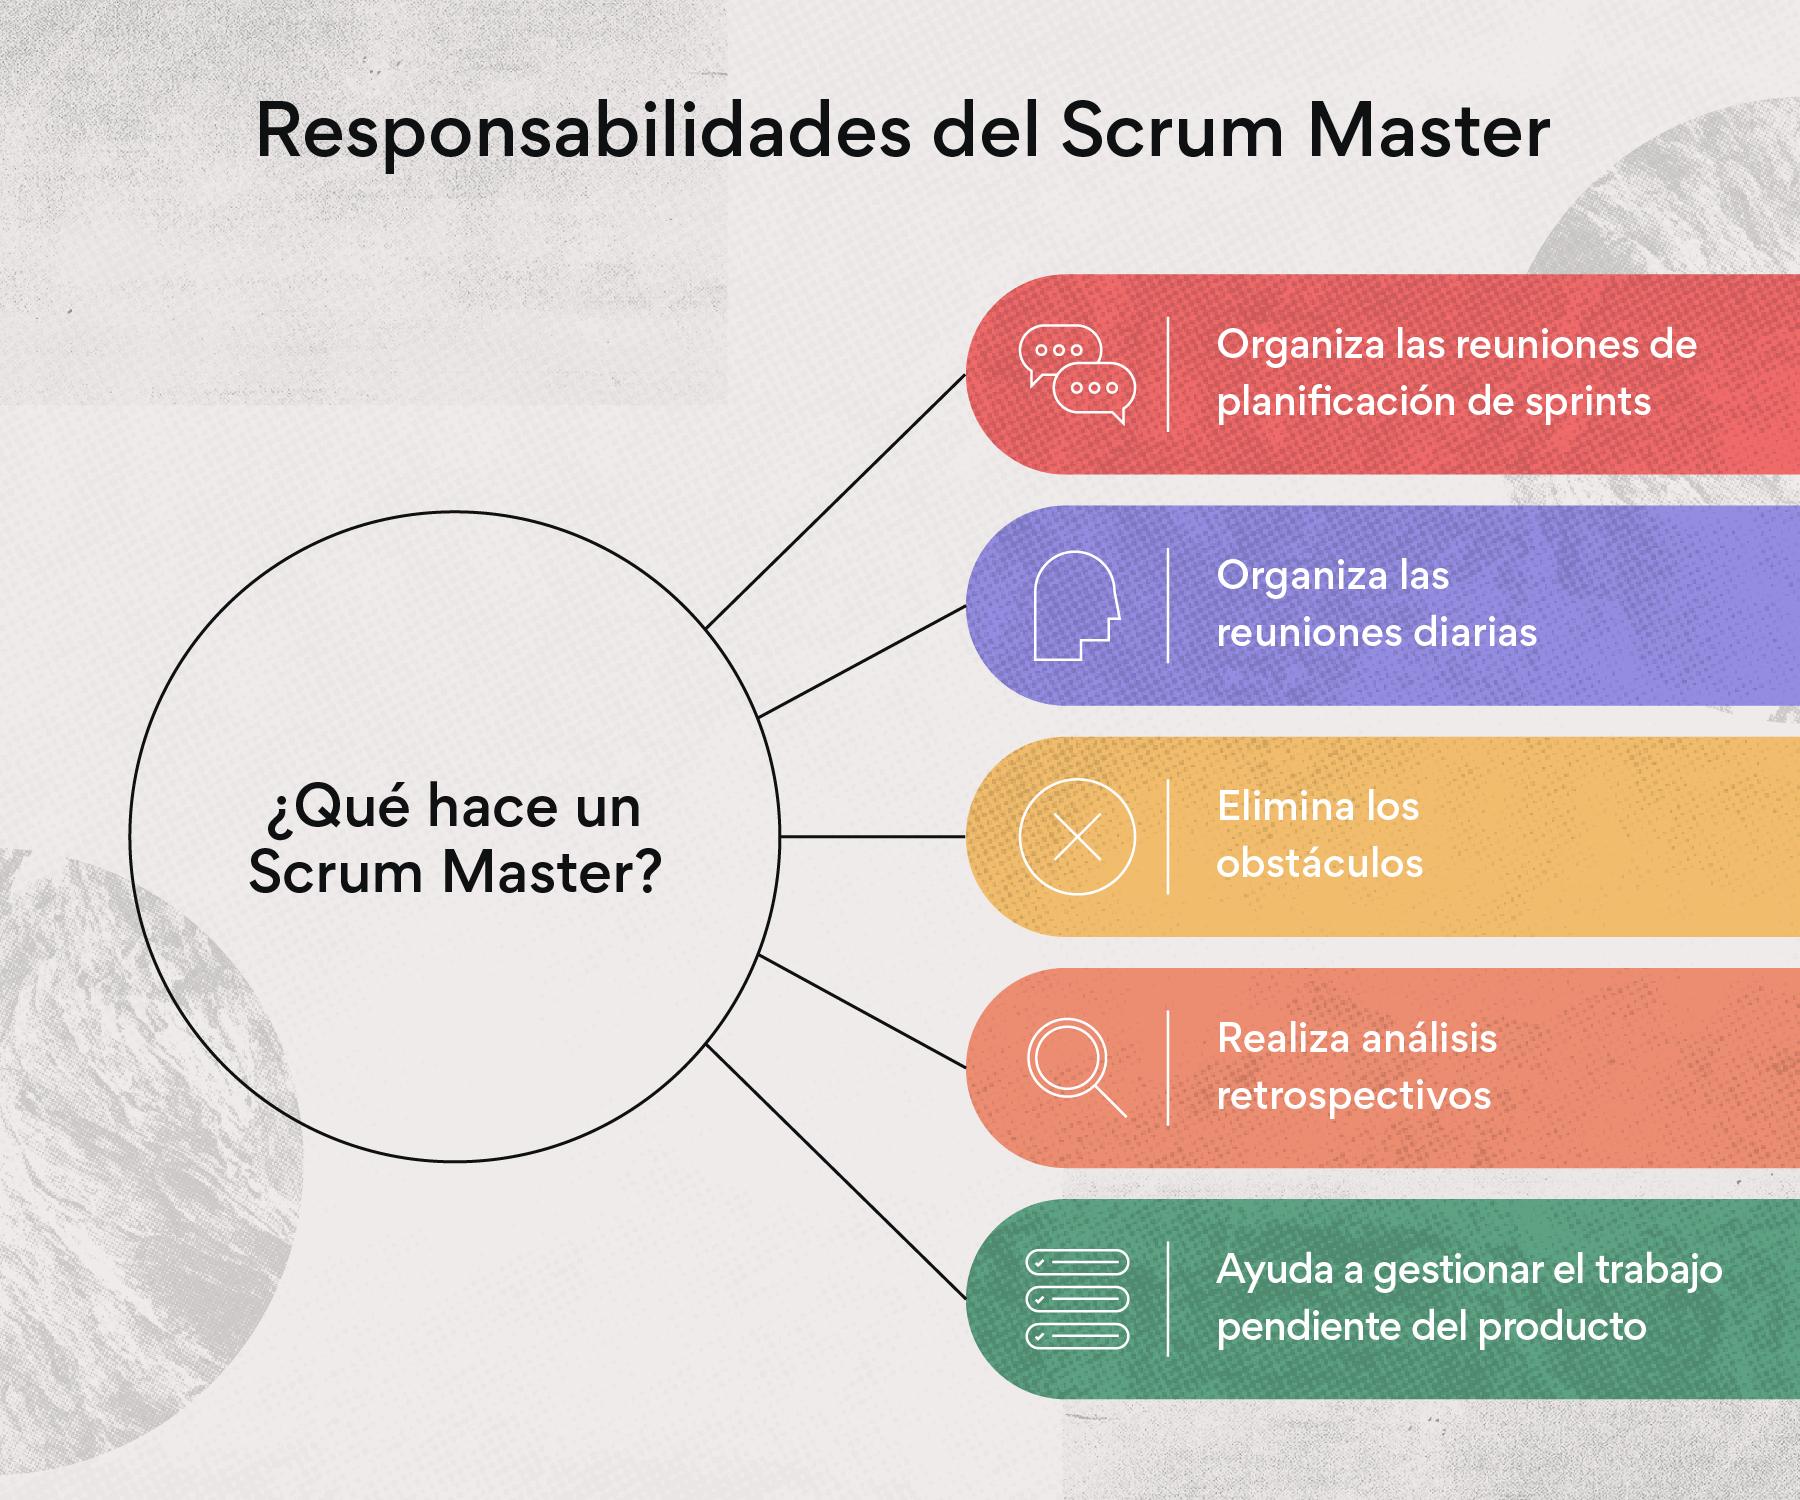 Responsabilidades del Scrum Master